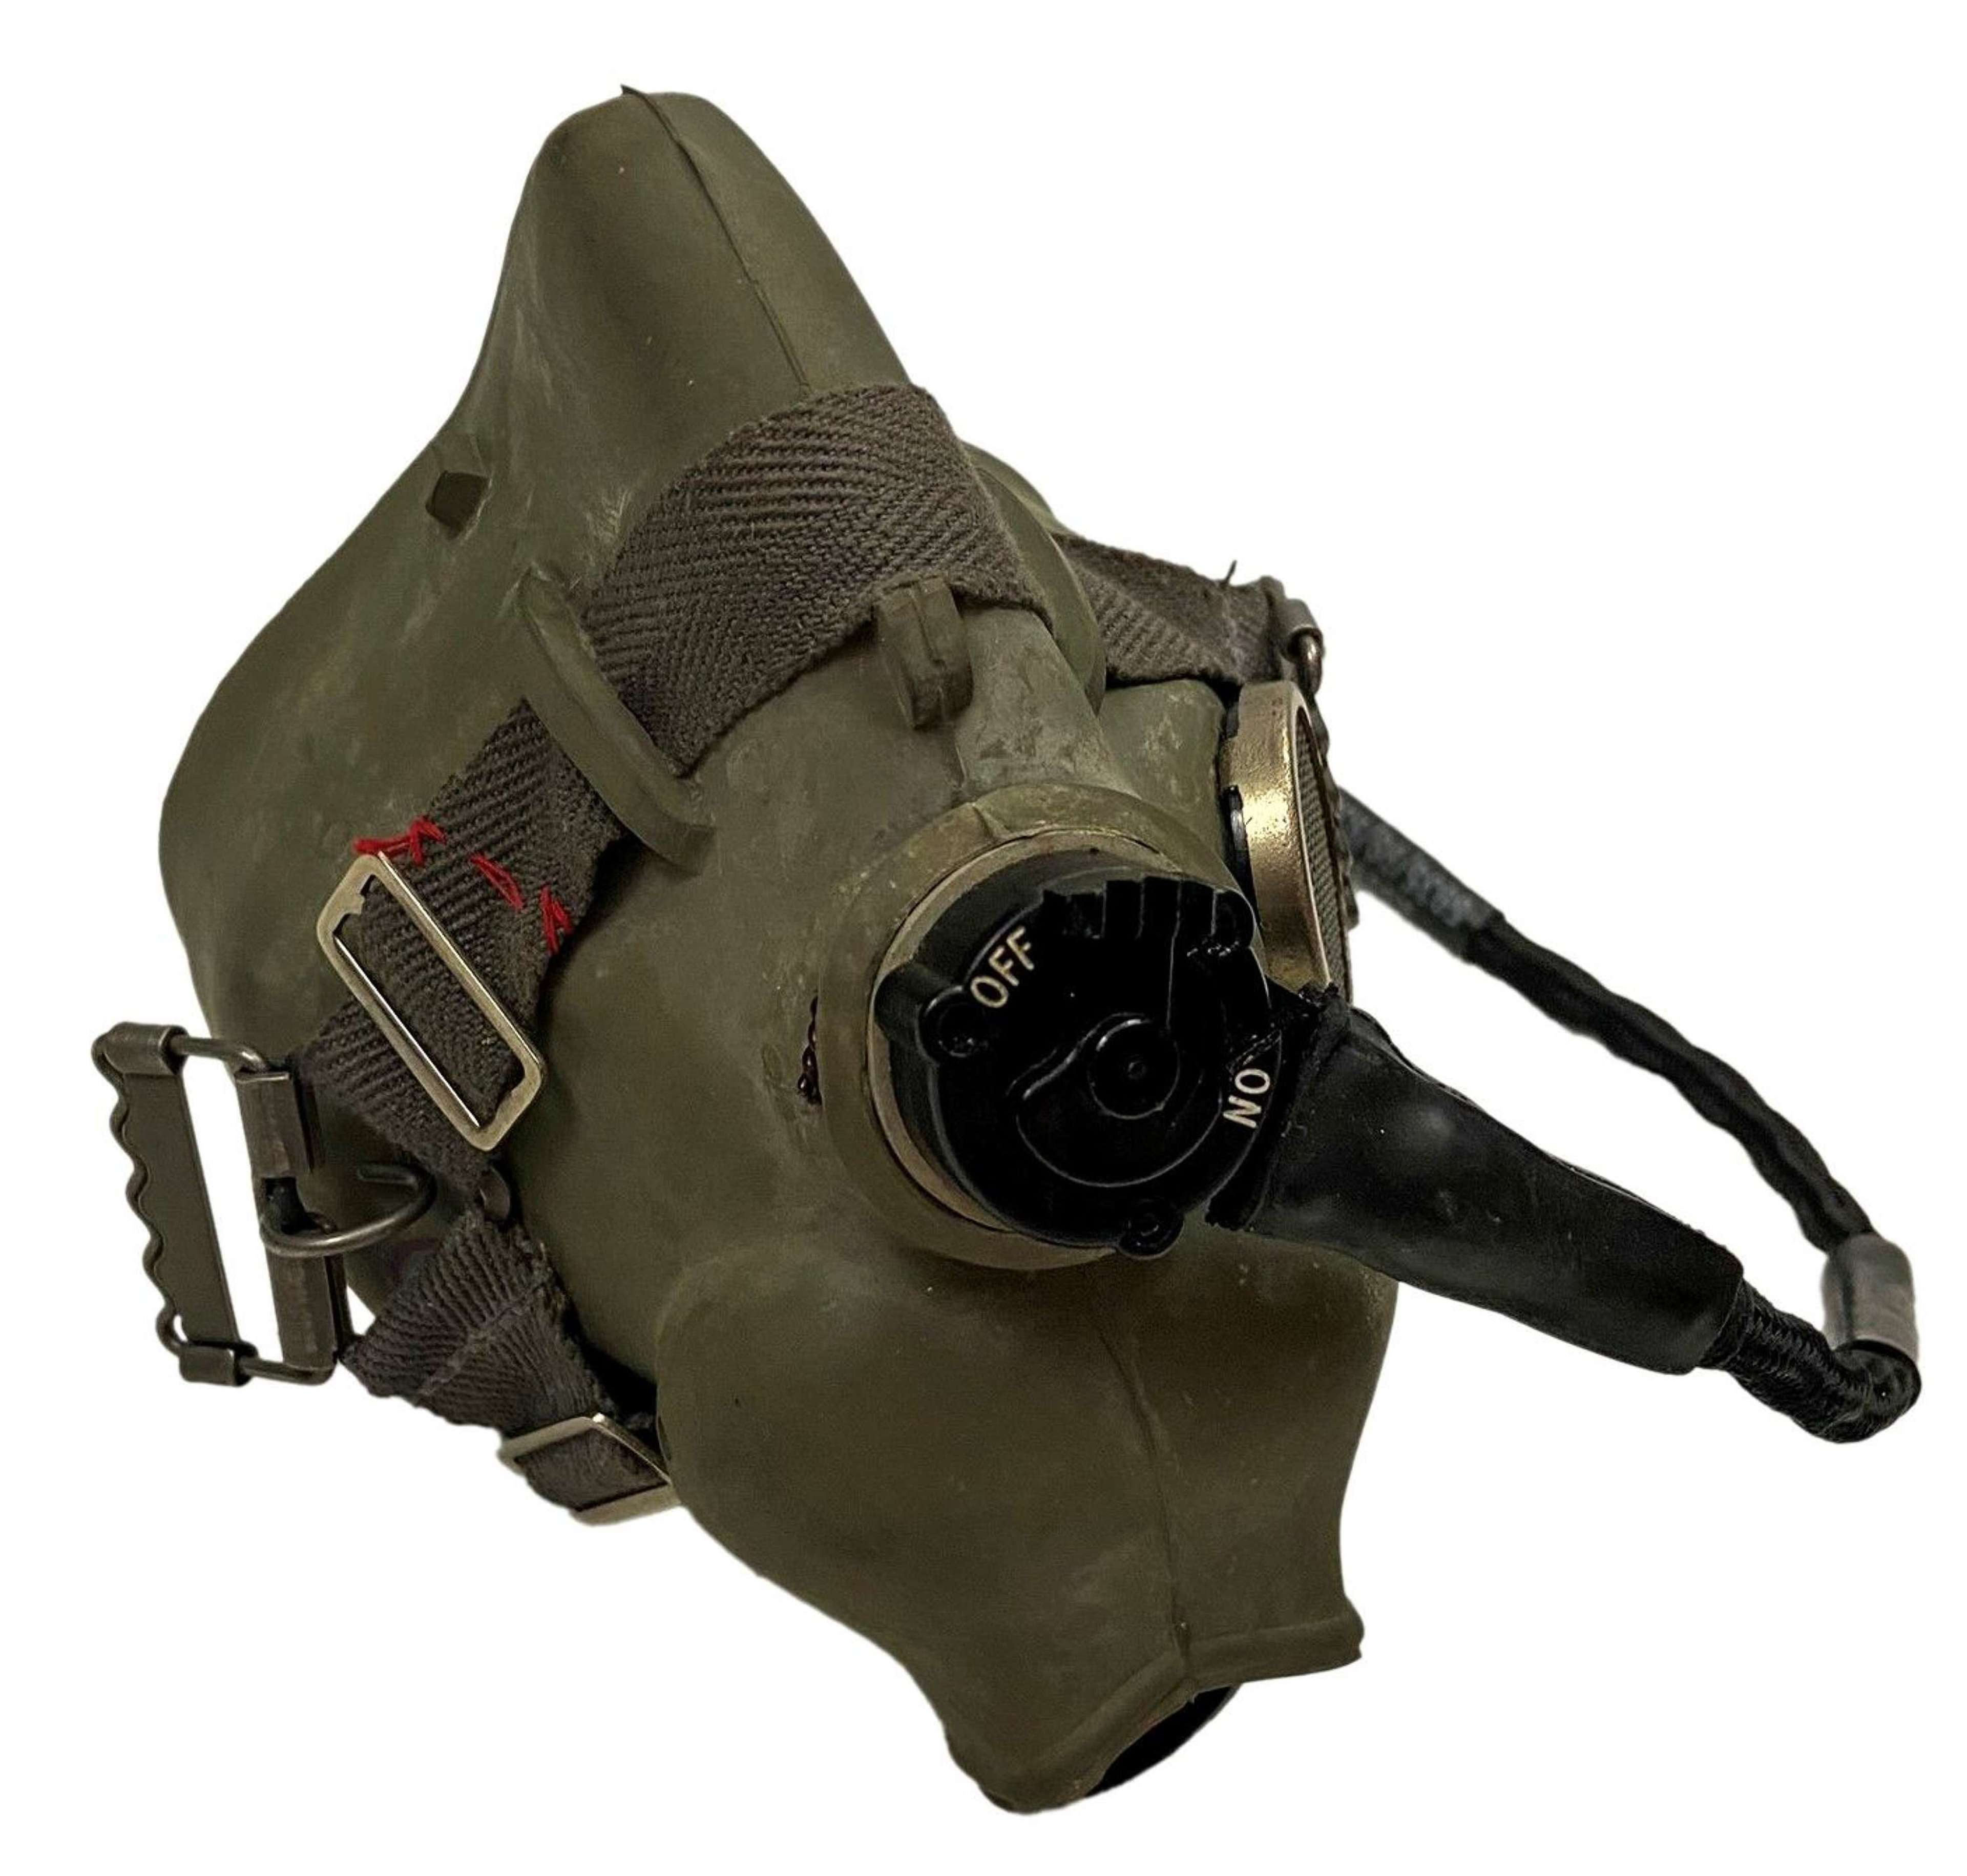 Original 1967 Dated RAF H Type Oxygen Mask - Size Medium